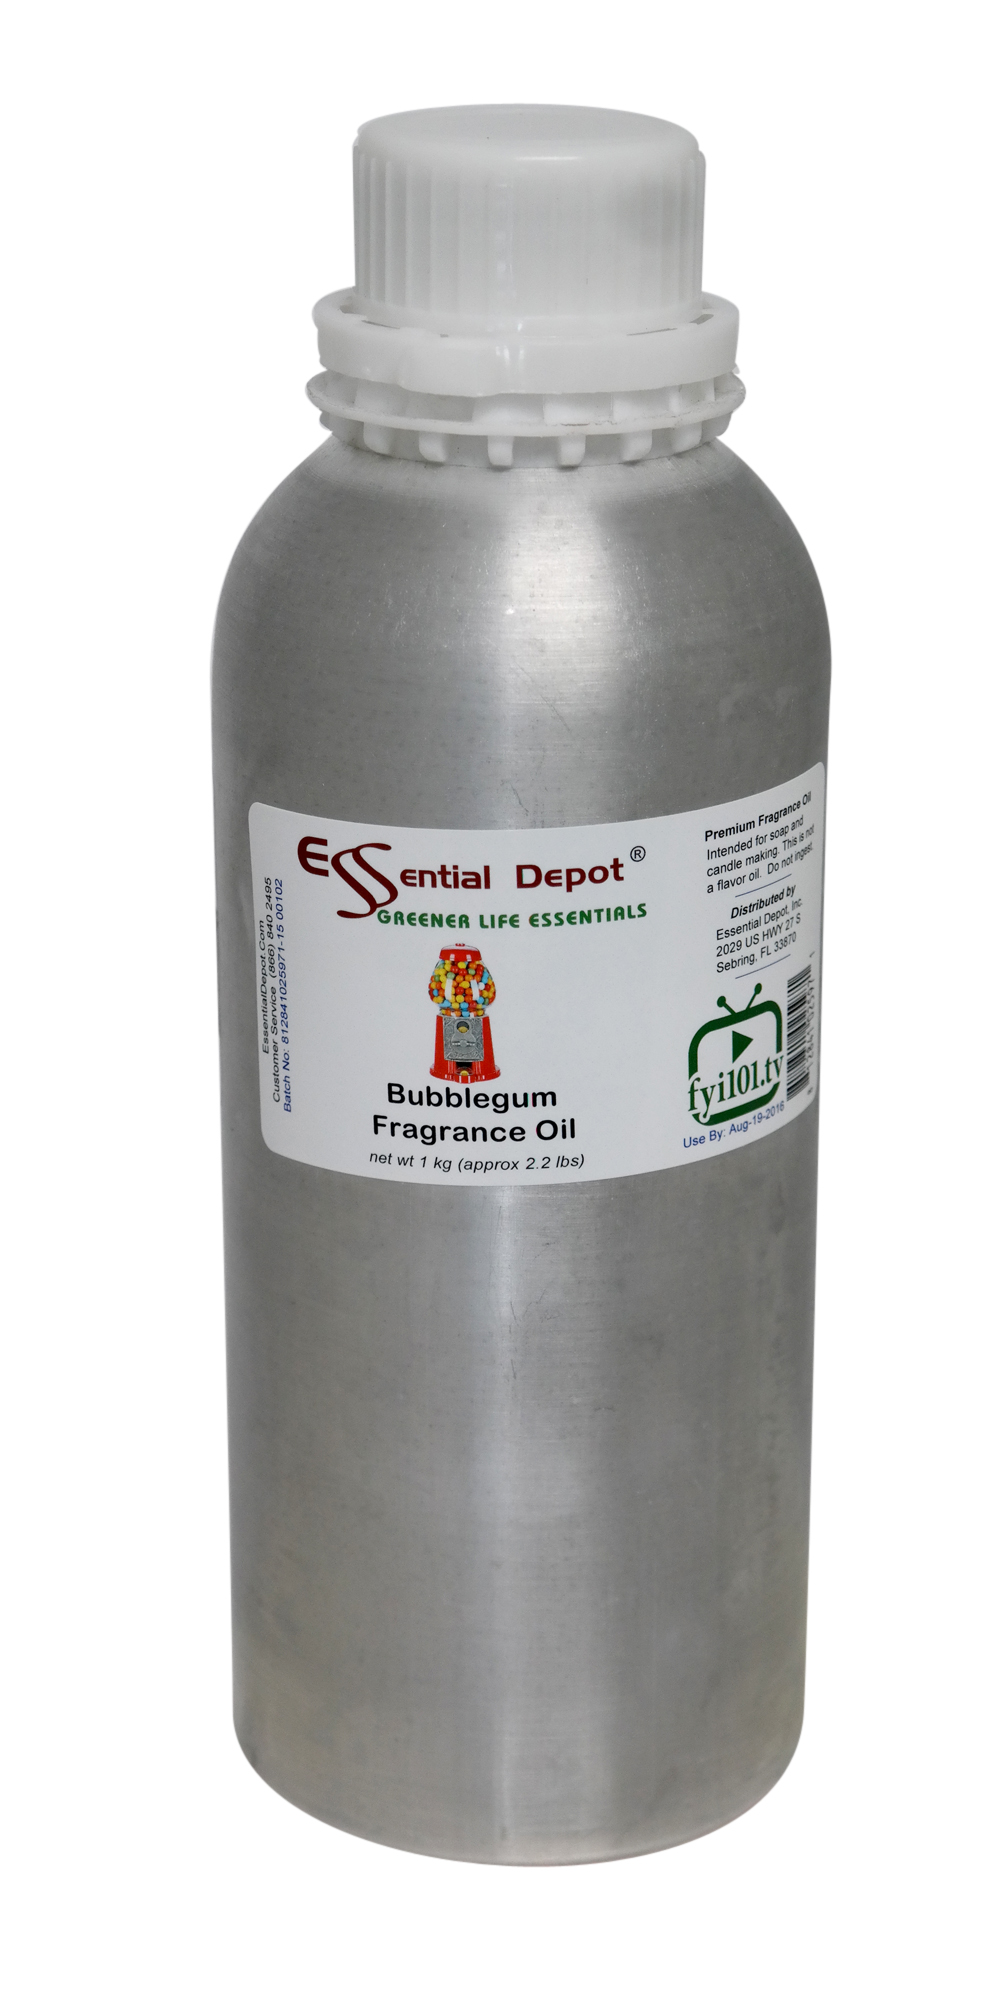 Bubblegum Fragrance Oil - 1 kg. - Approx 2.2 lbs. - FREE US SHIPPING